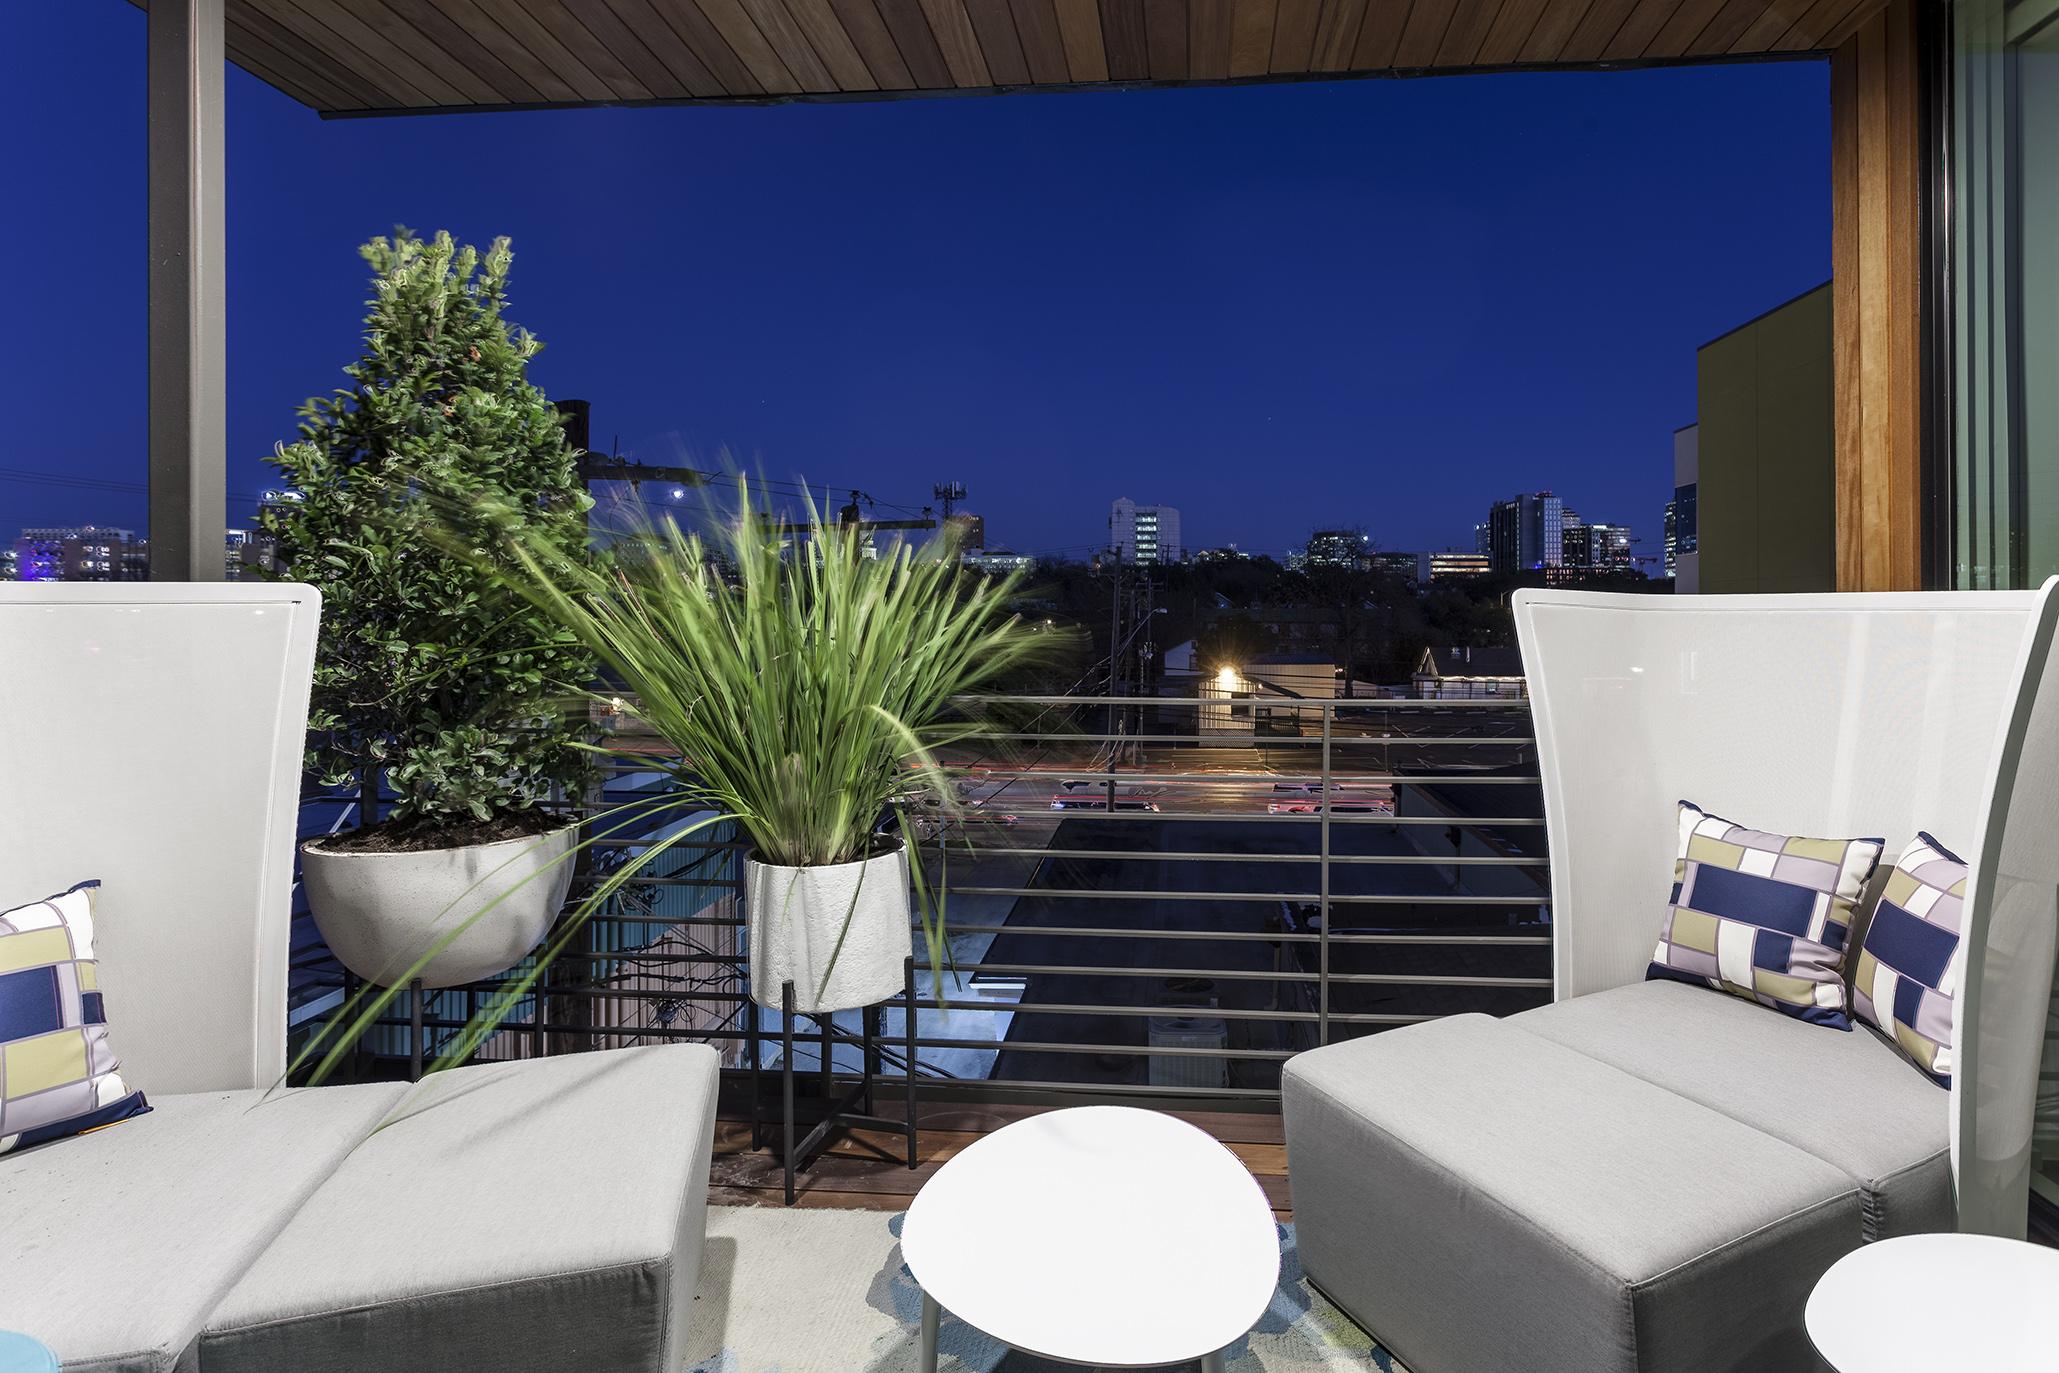 patio-blue.jpg